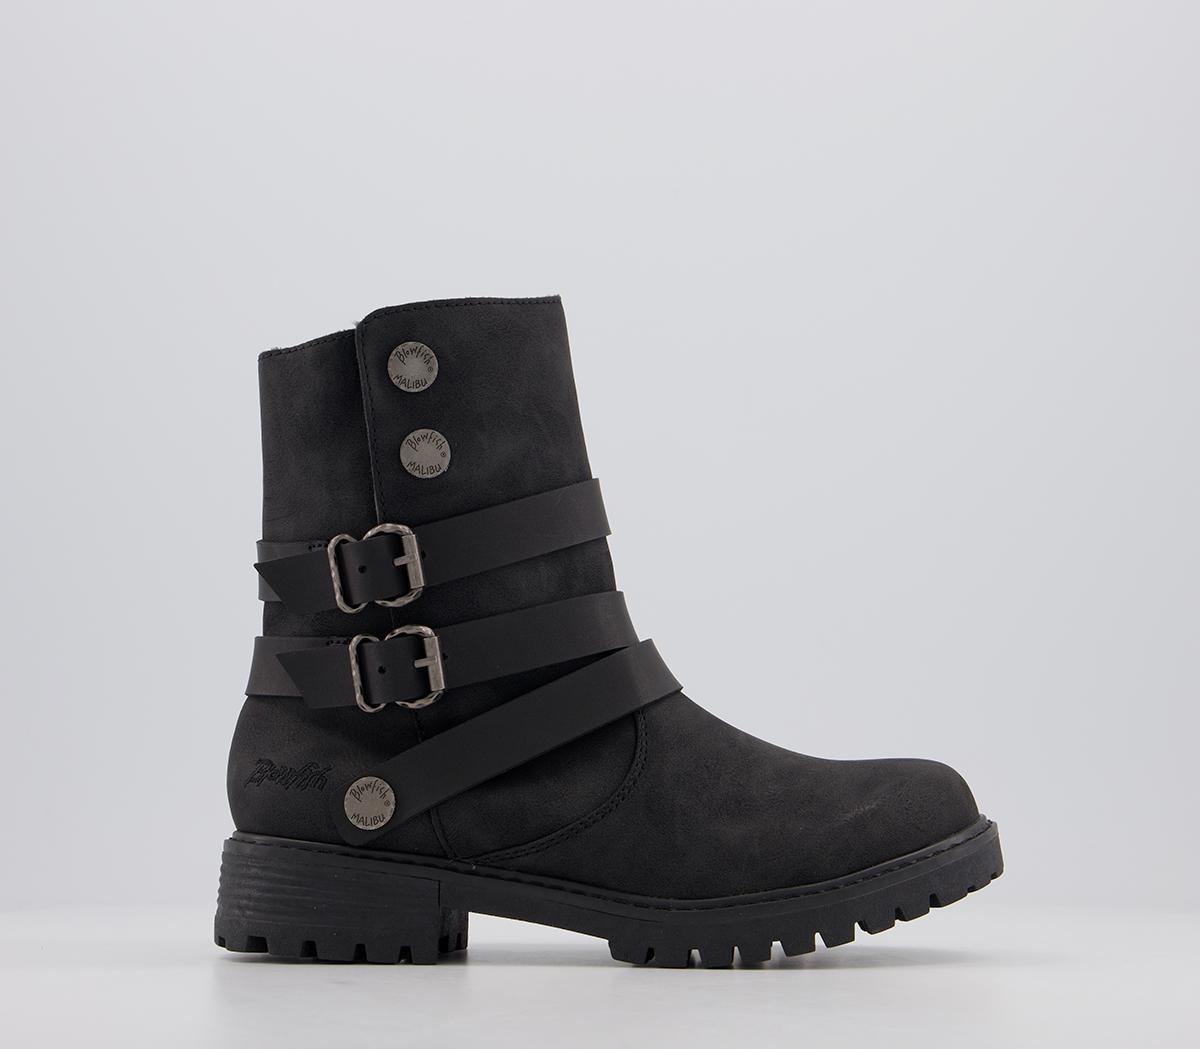 Radiki Shr Boots